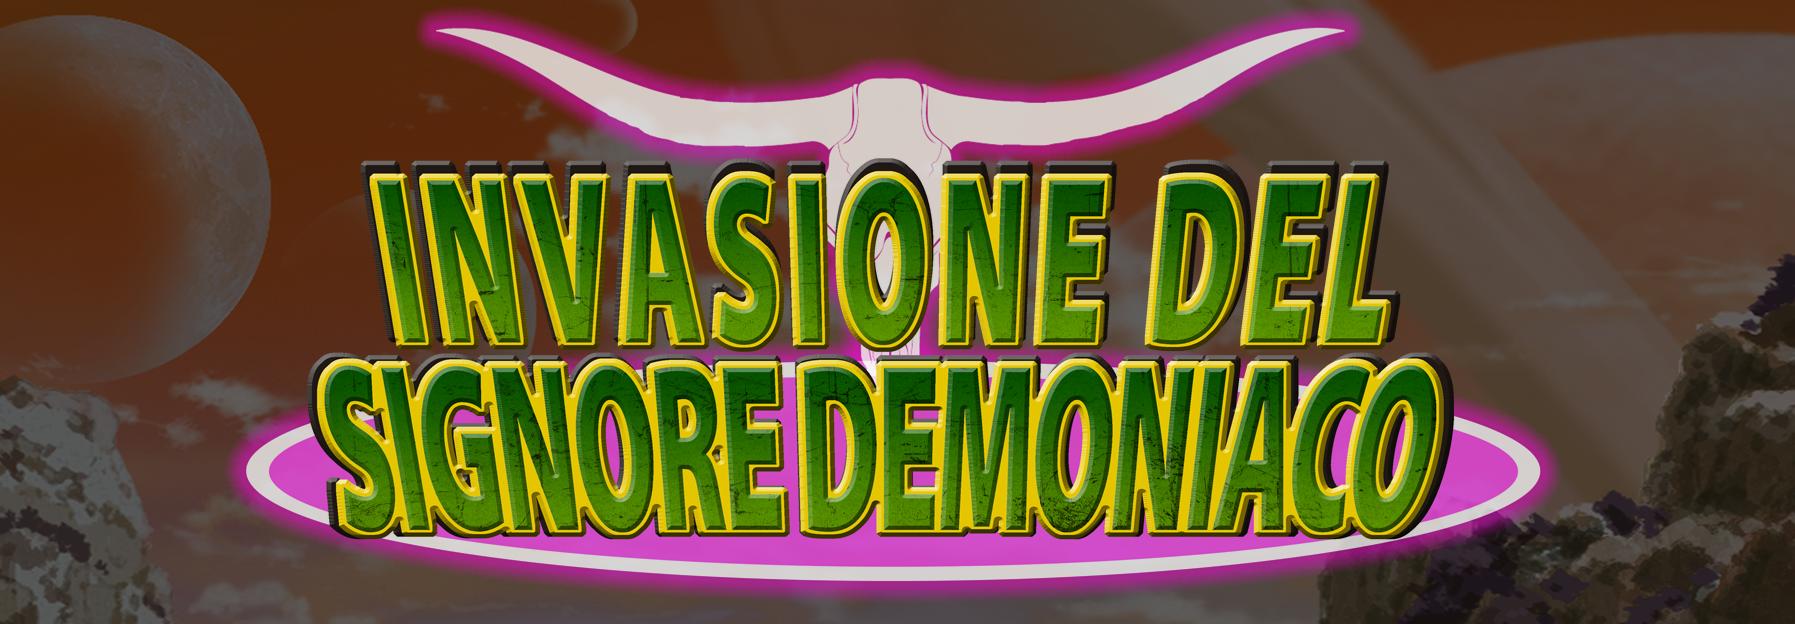 BUSTA BT03: INVASIONE DEL SIGNORE DEMONIACO